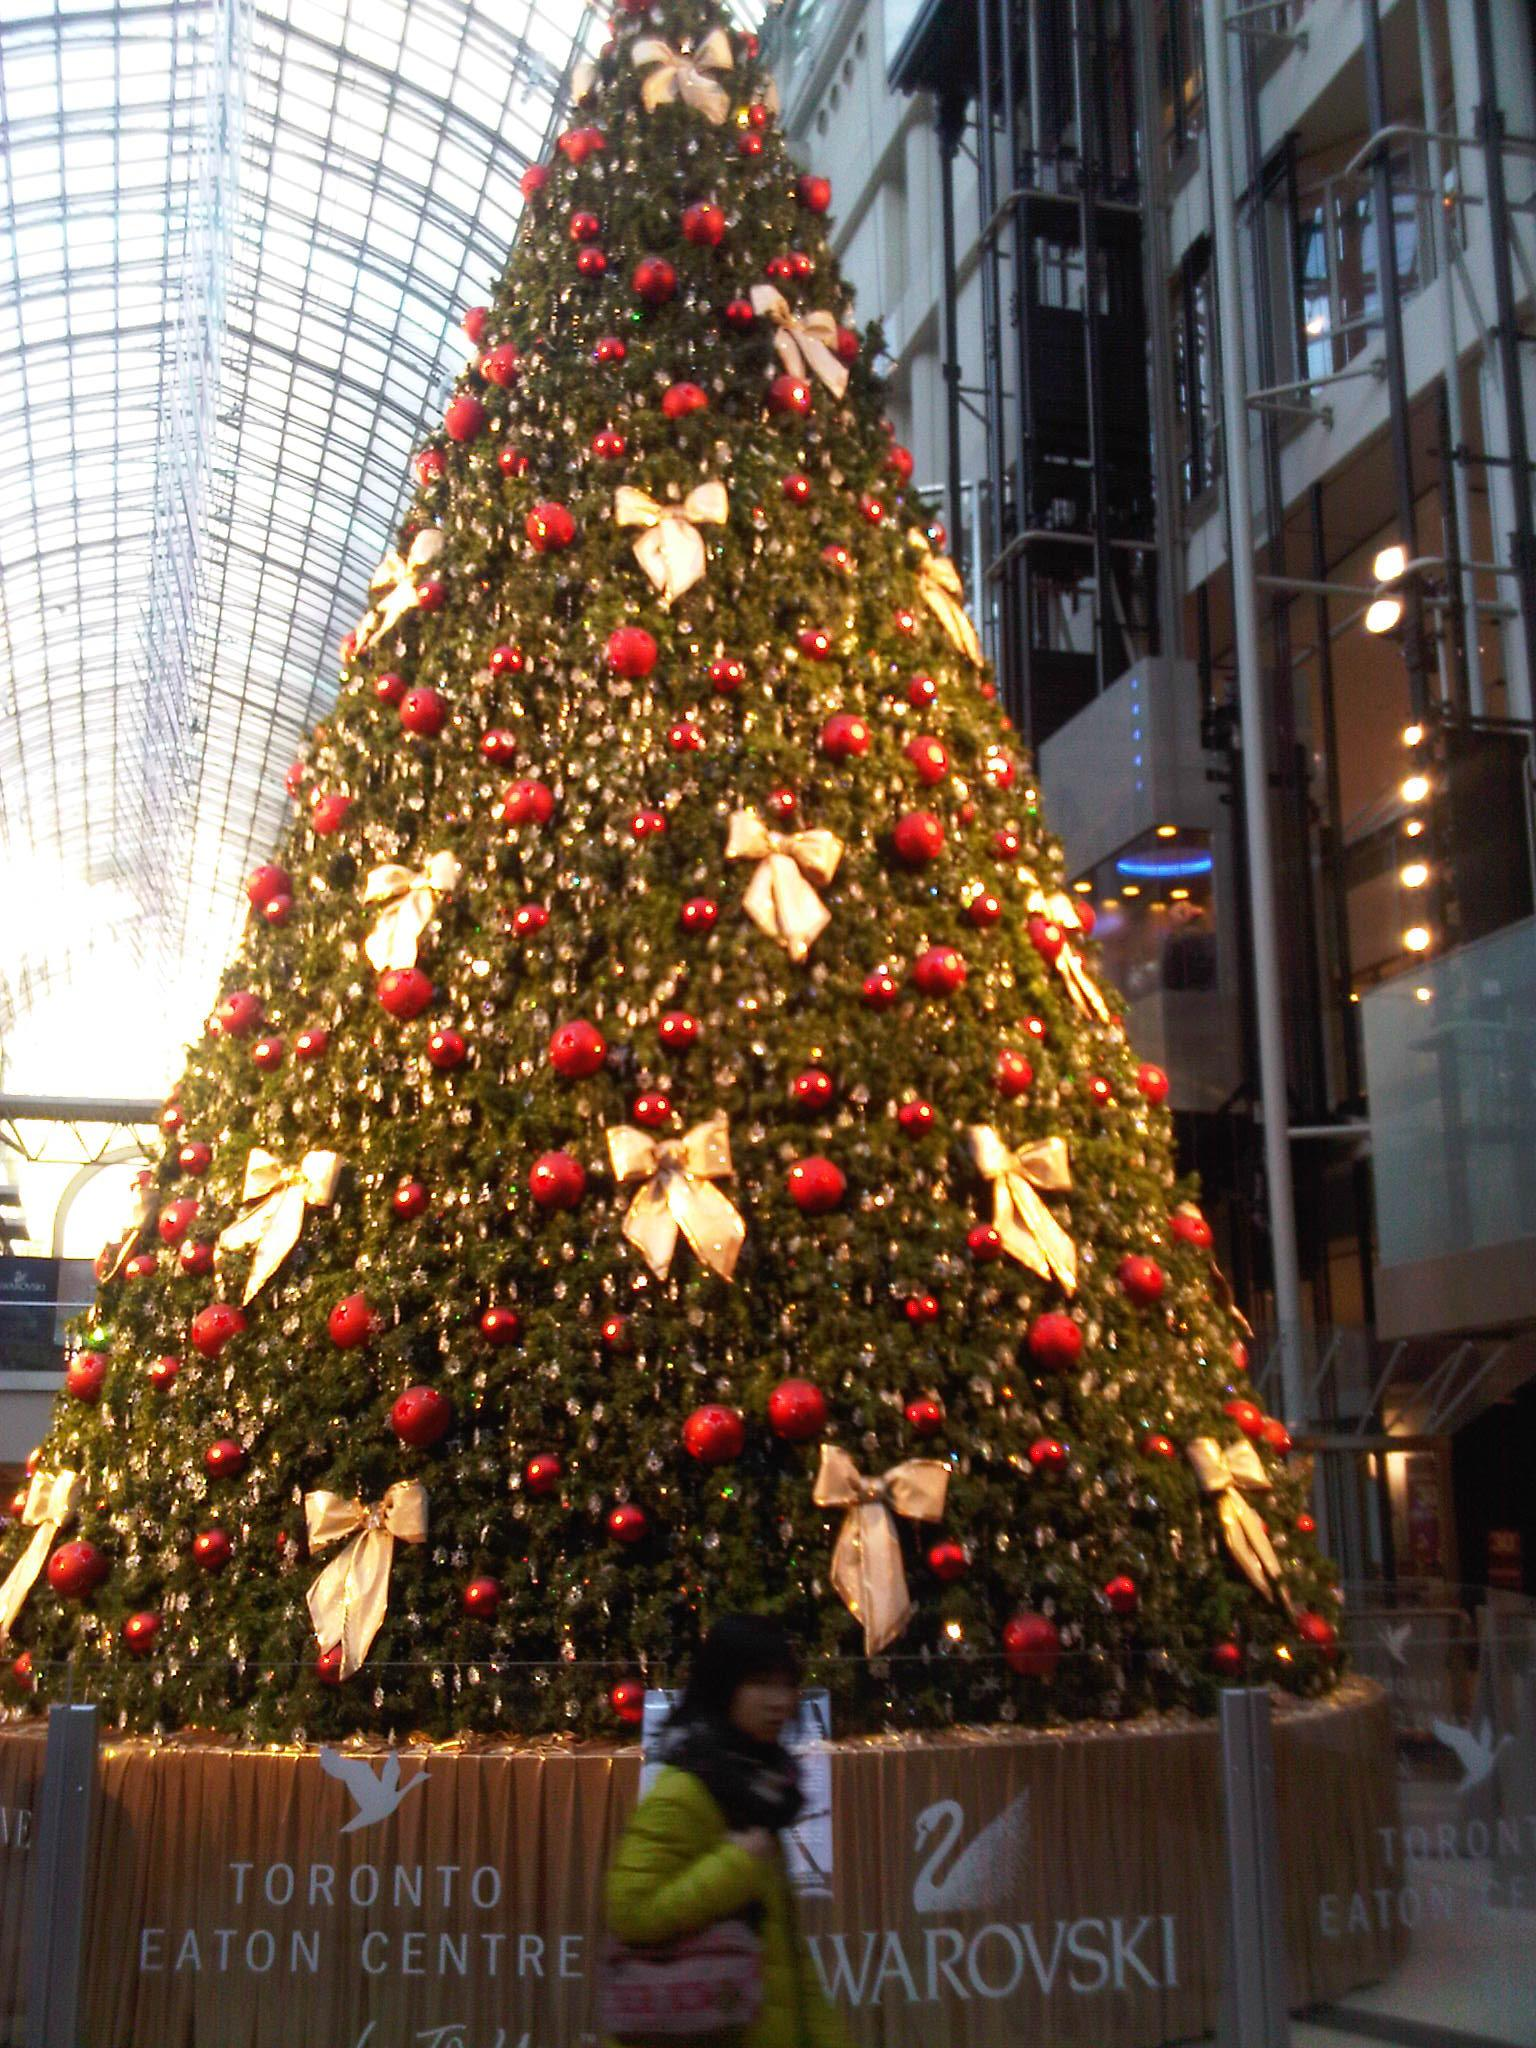 Swarovski Christmas Tree At Eaton Centre